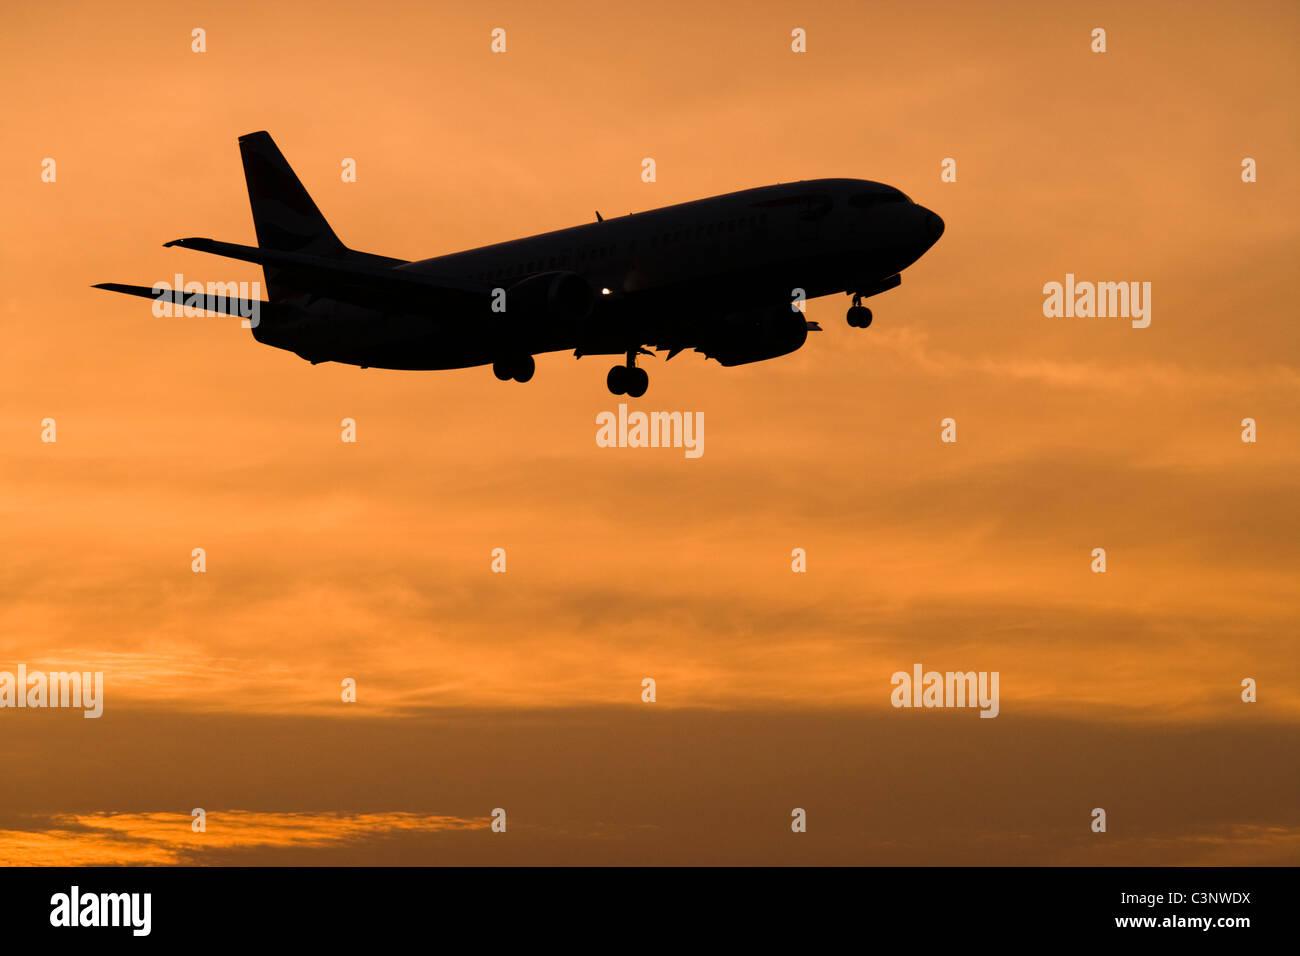 Aeroplane about to land. - Stock Image